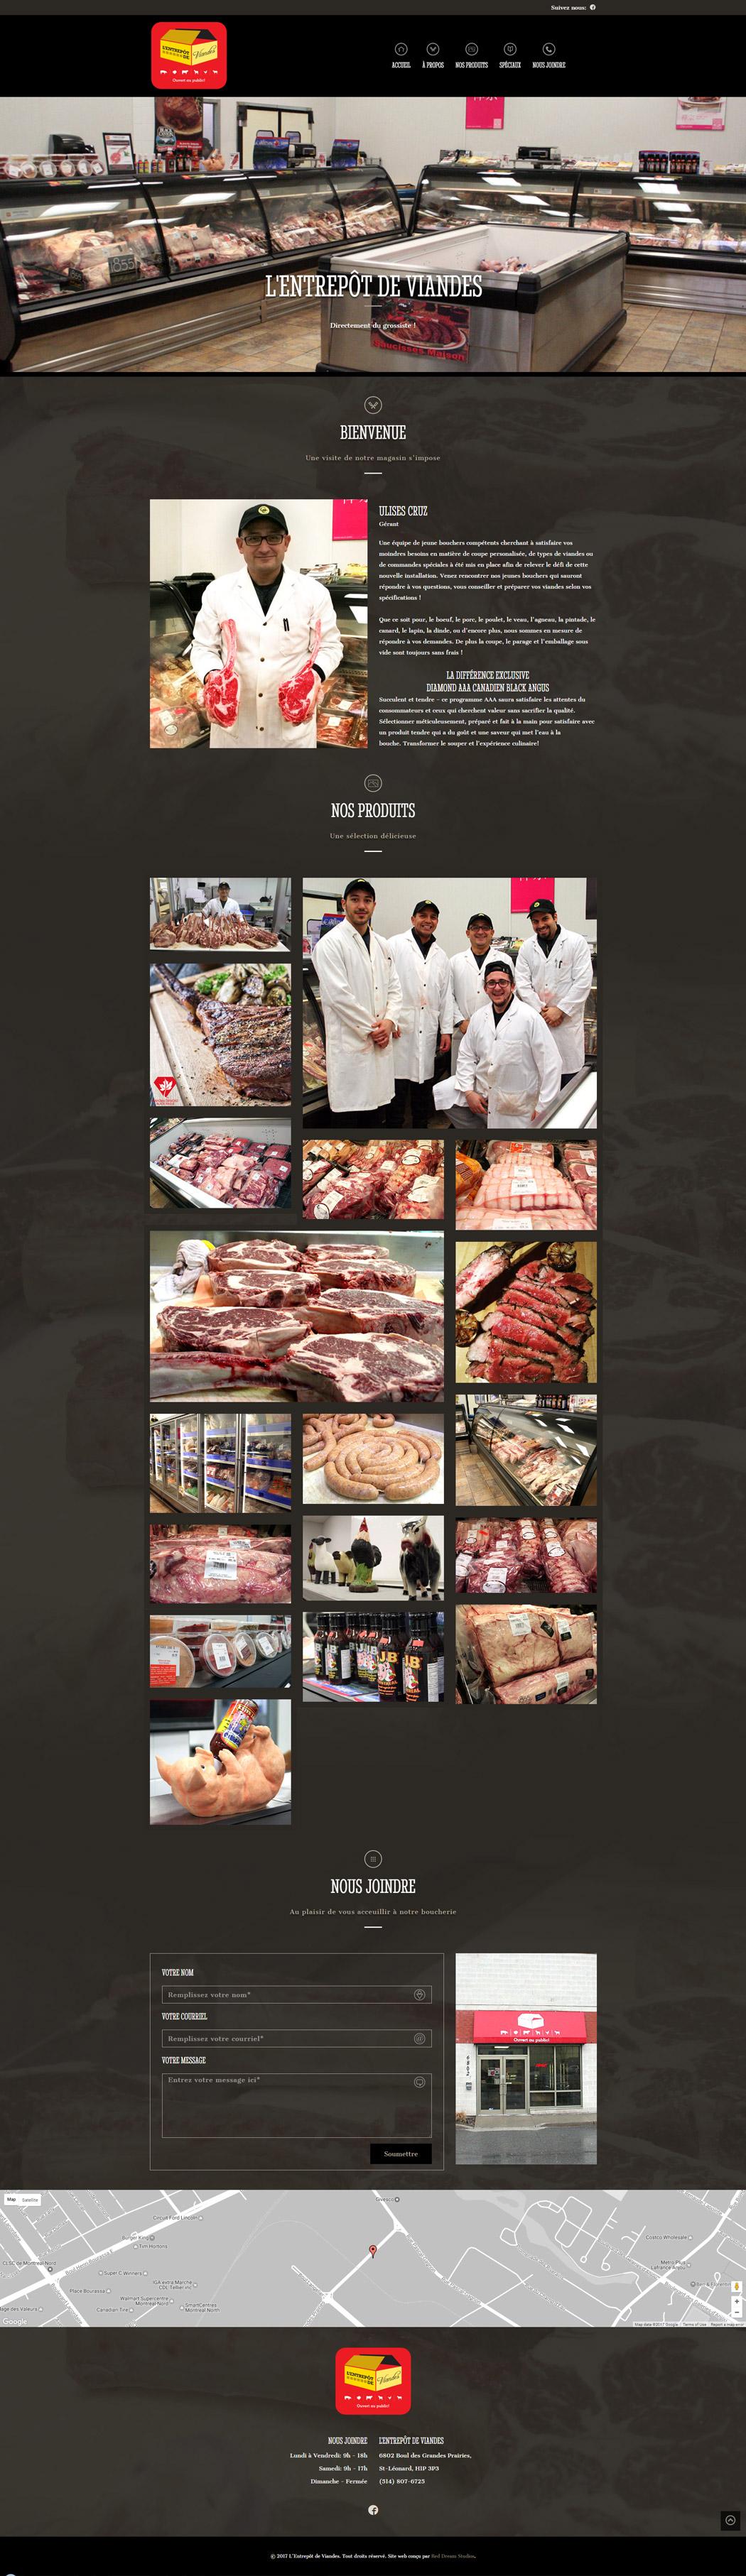 entrepot-de-viande-after